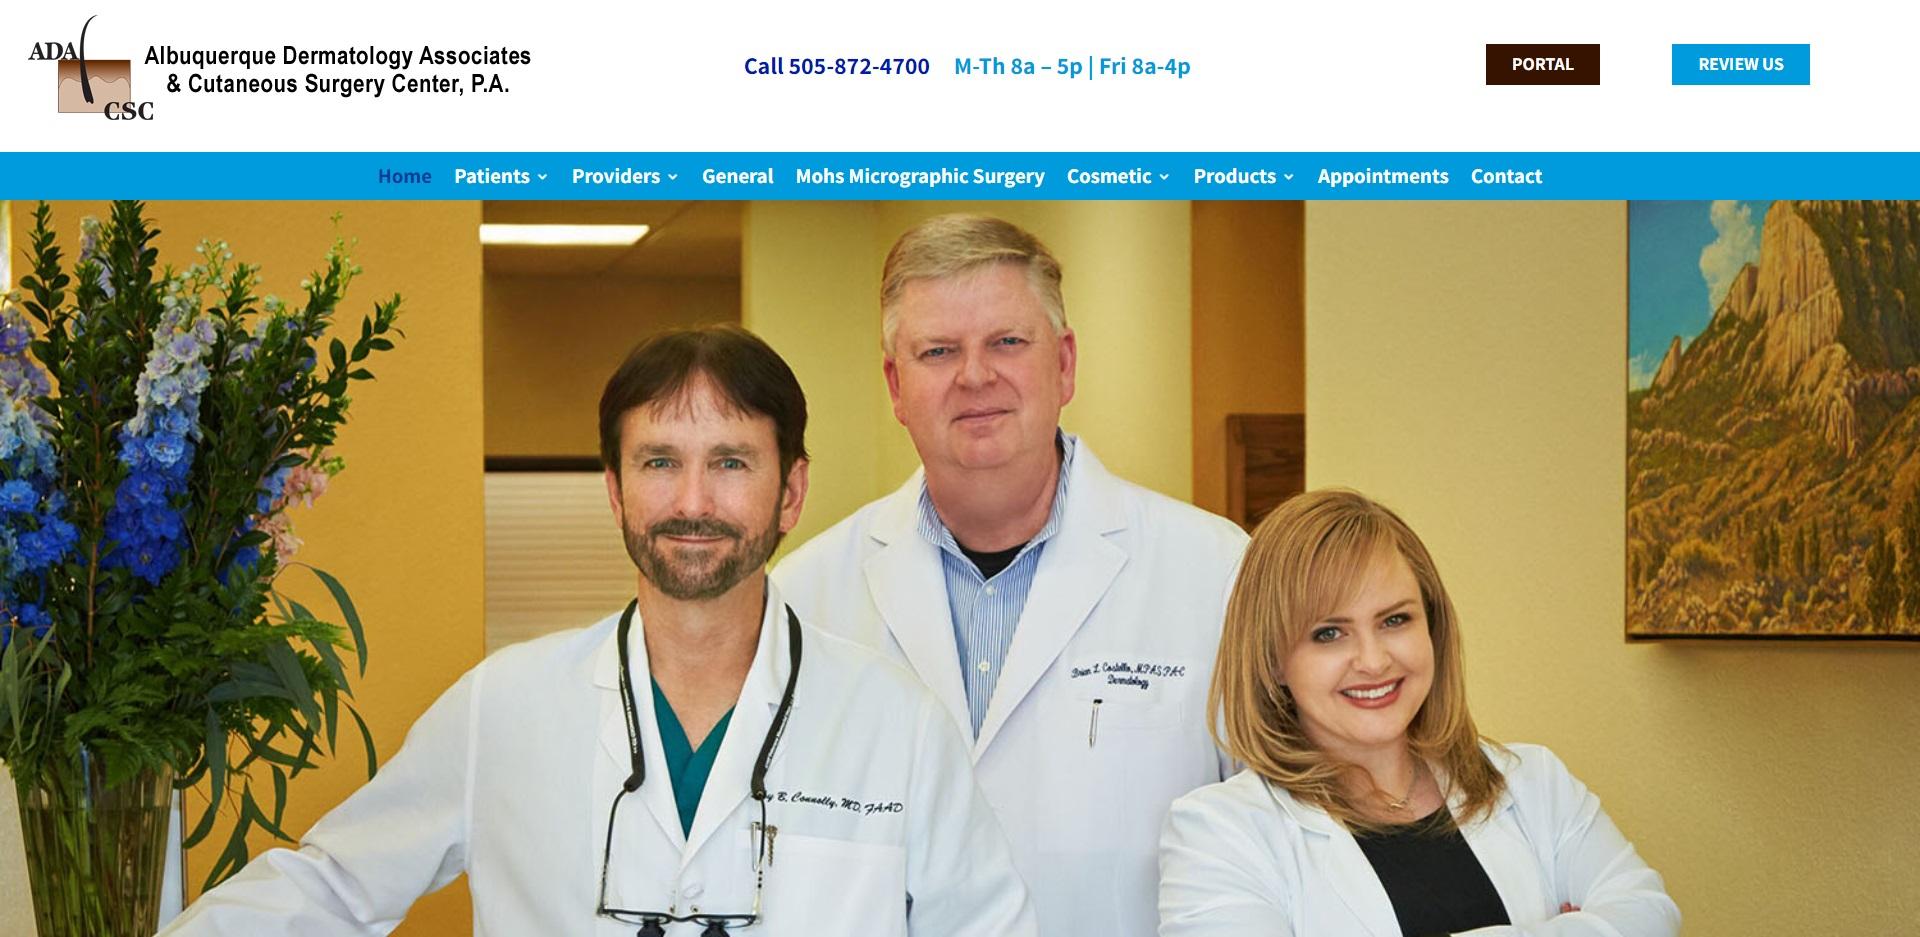 The Best Dermatologists in Albuquerque, NM